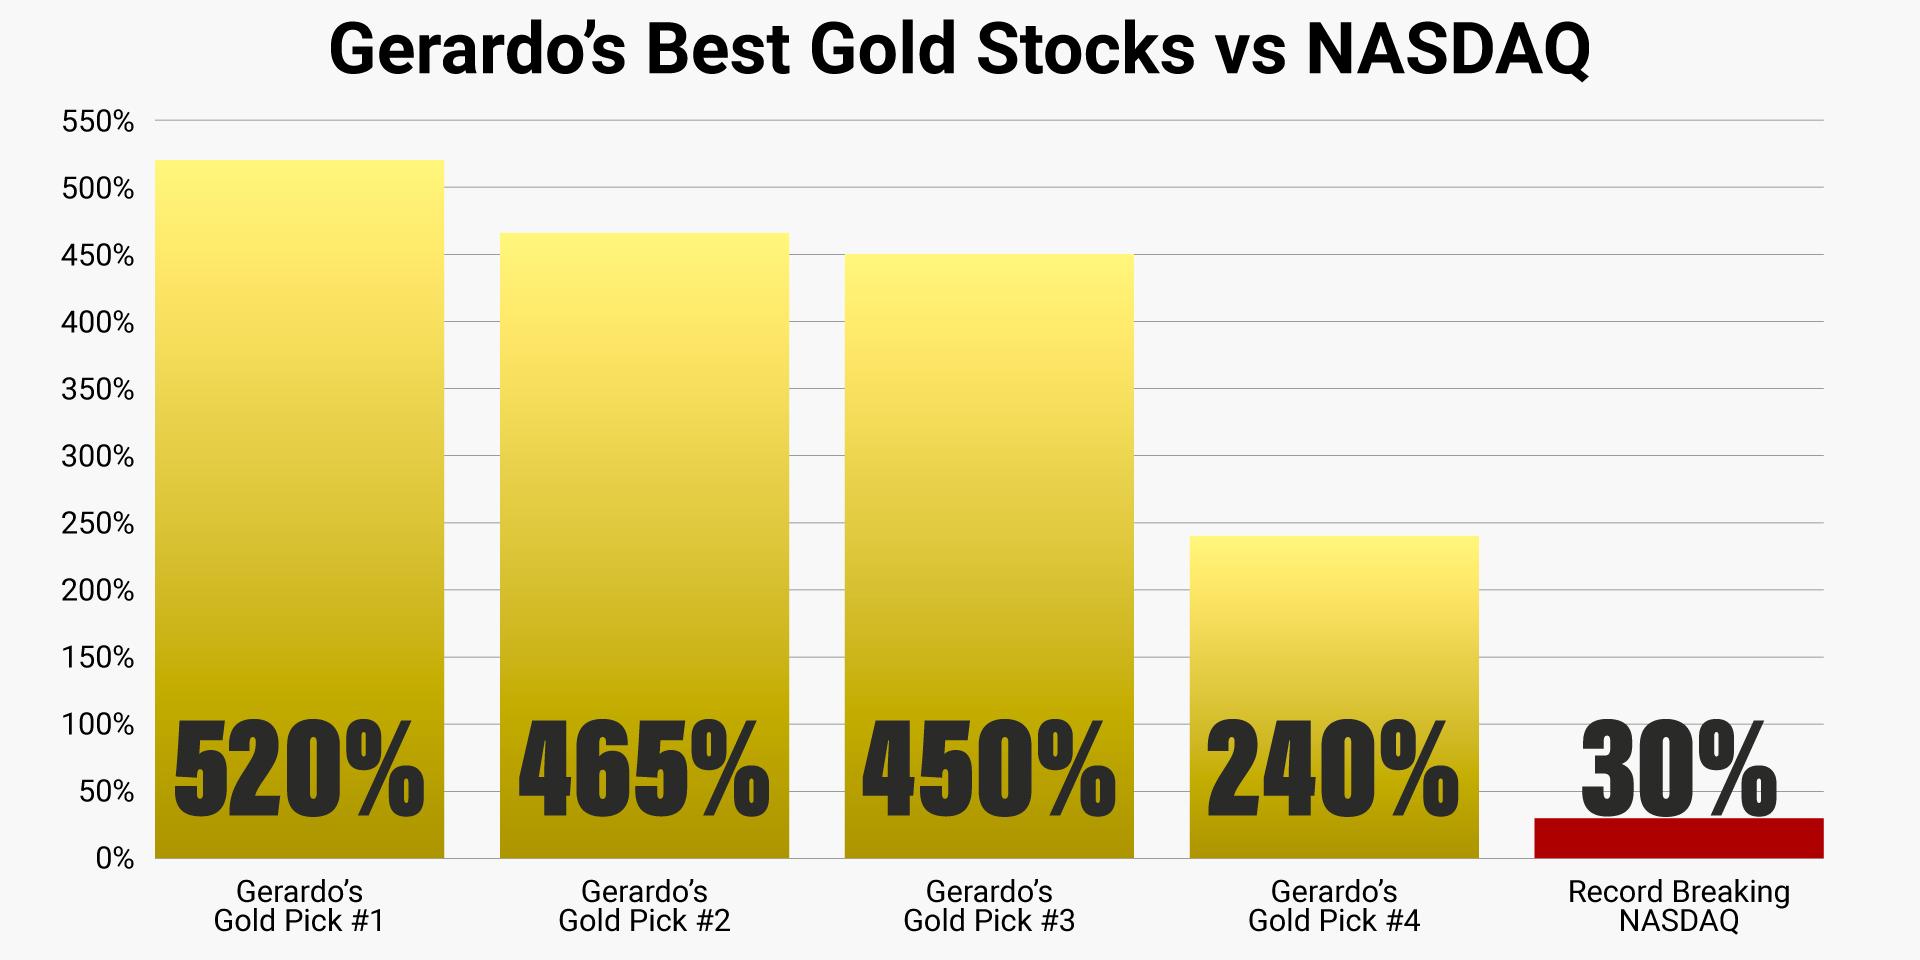 gerardo-top-gold-picks-vs-nasdaq